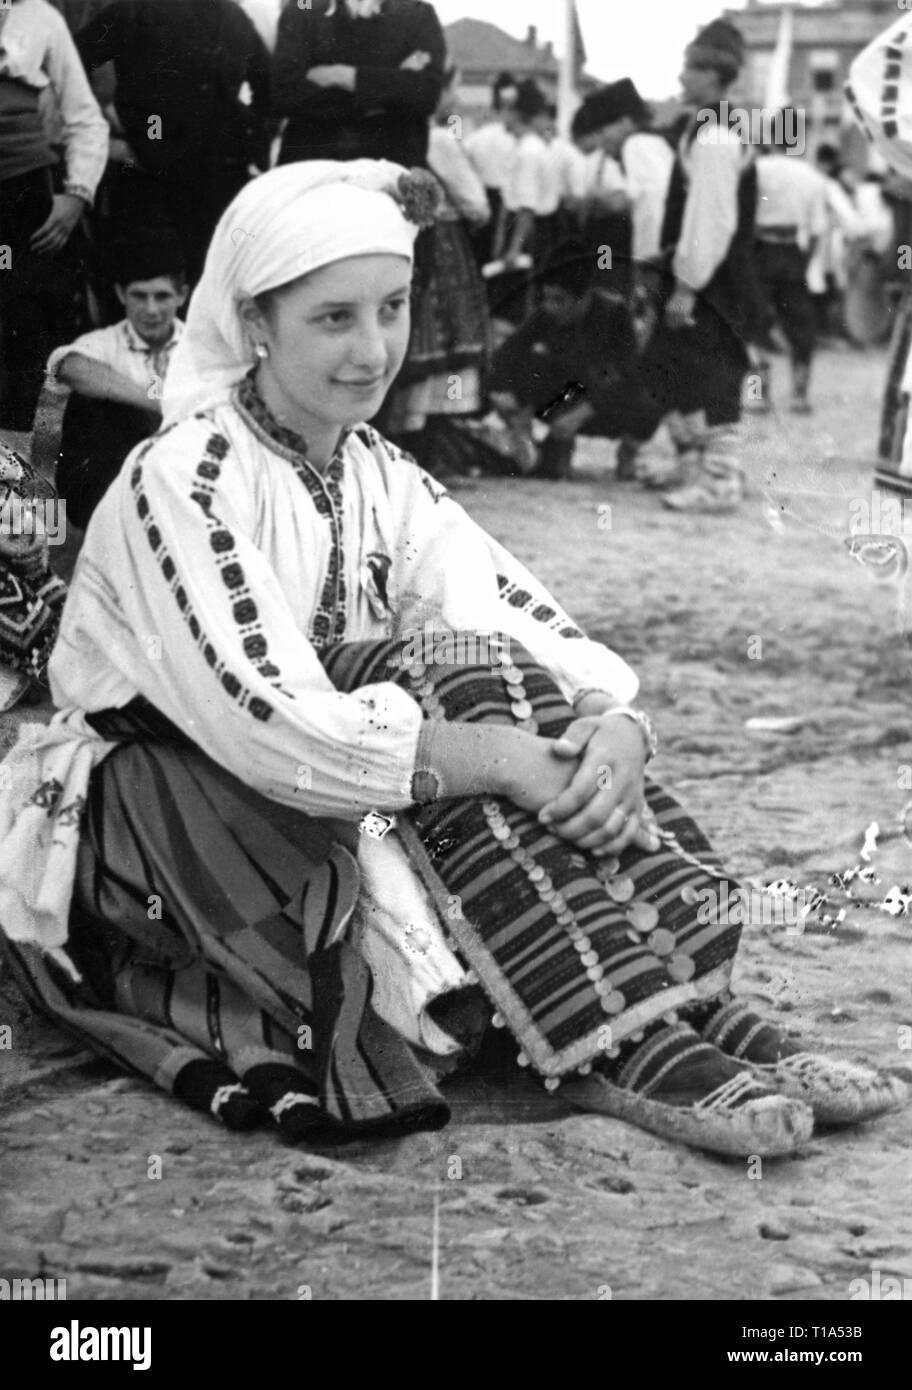 Geographie/Reisen historische, Bulgarien, Folklore, bulgarische Frau in Tracht, circa 1935, Additional-Rights - Clearance-Info - Not-Available Stockbild